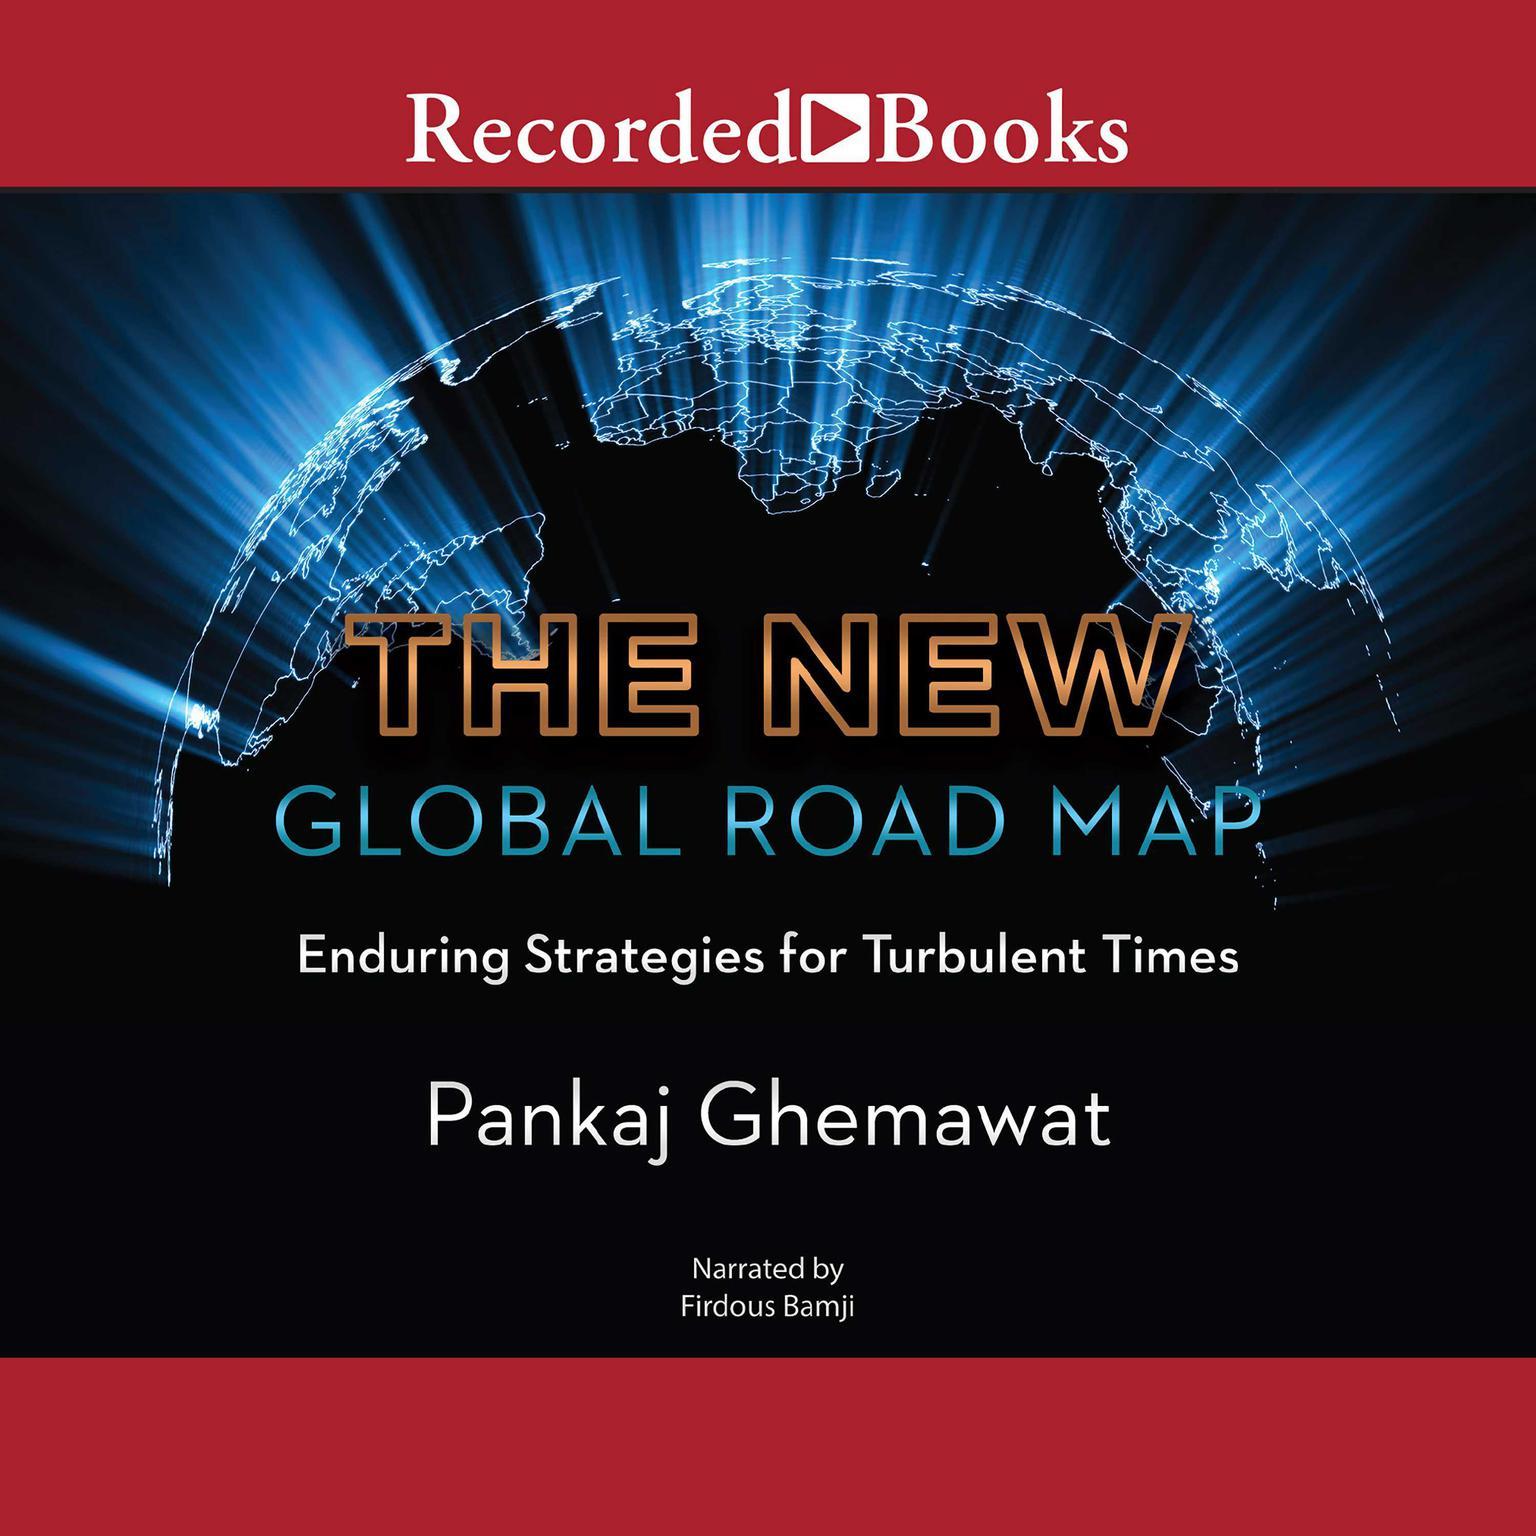 The New Global Road Map: Enduring Strategies for Turbulent Times Audiobook, by Pankaj Ghemawat